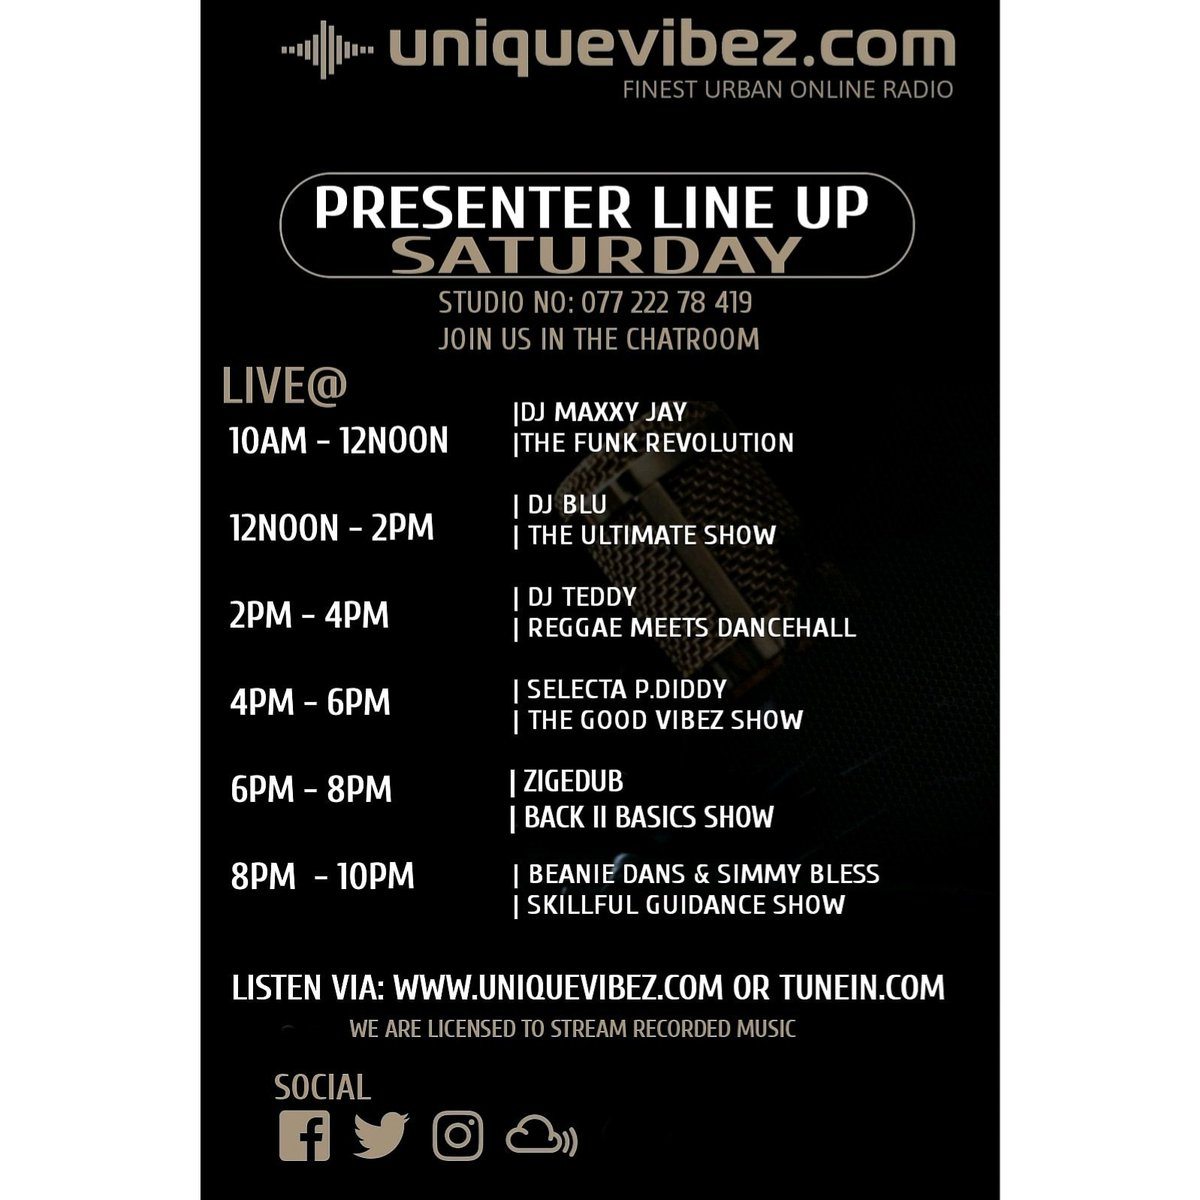 #saturday from 10am #bst on http://uniquevibez.com #funk #soul #neosoul #afrobeats #rnb #reggae #reggaerevival #dancehall #bashment #reggaevocals #hiphop #oldskool #nuskool and more  #internetradio  #vibes  #onlineradio  #entertainnent  #djs  #radiopresenter